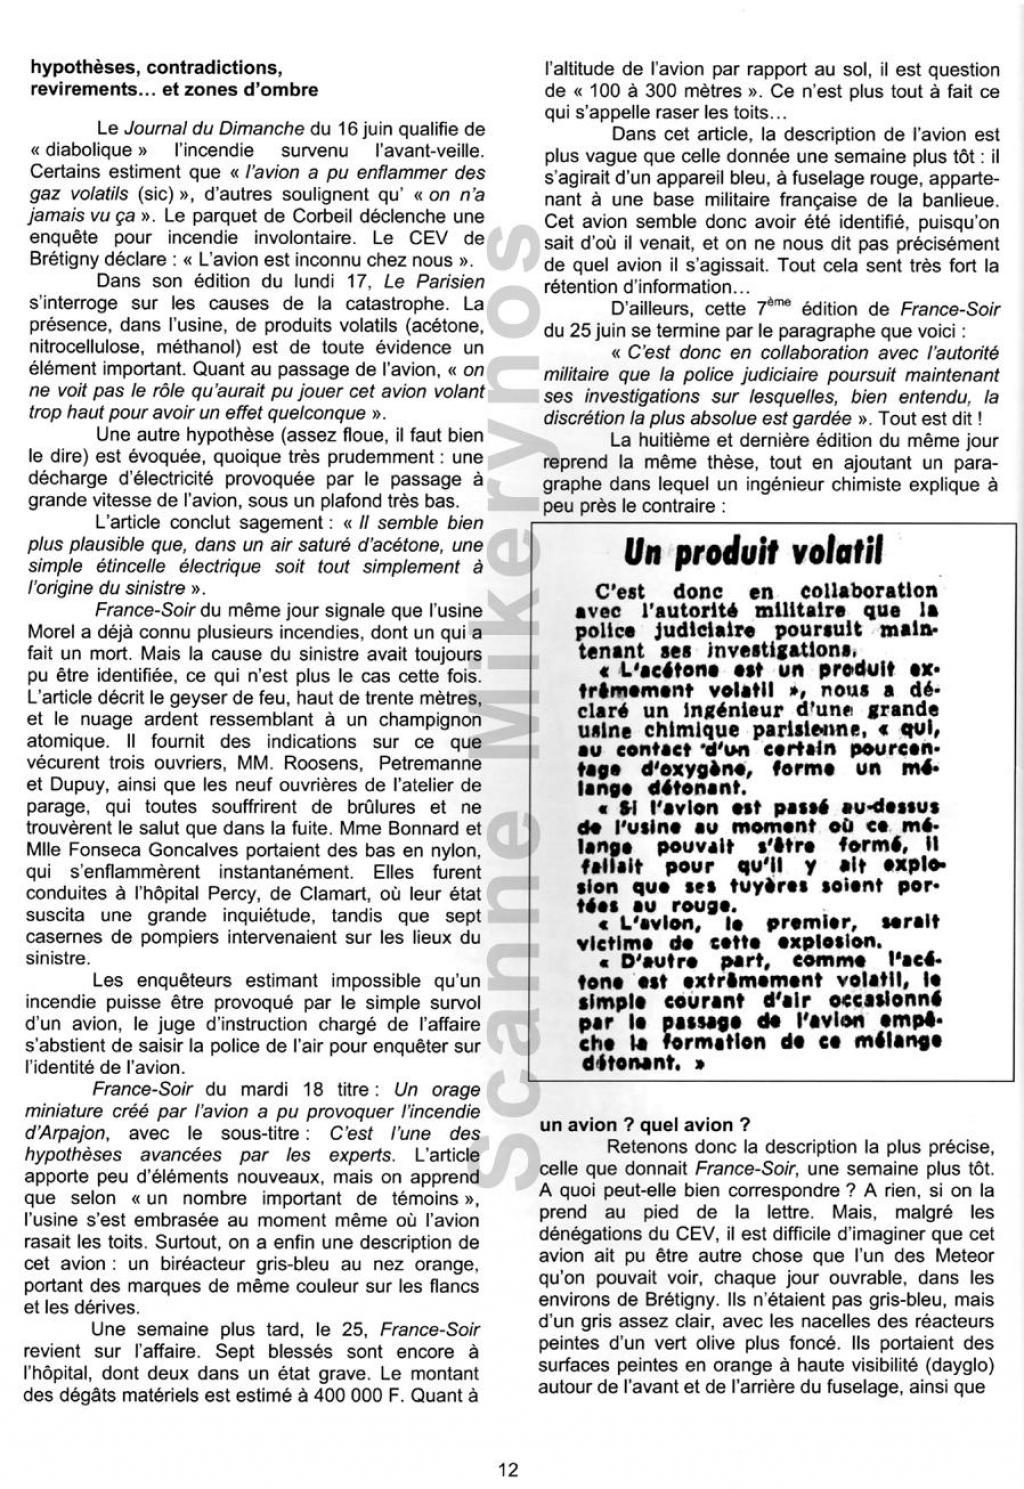 Saint Germain les Arpajon  - Le 14 Juin 1963 Fr12-3095500